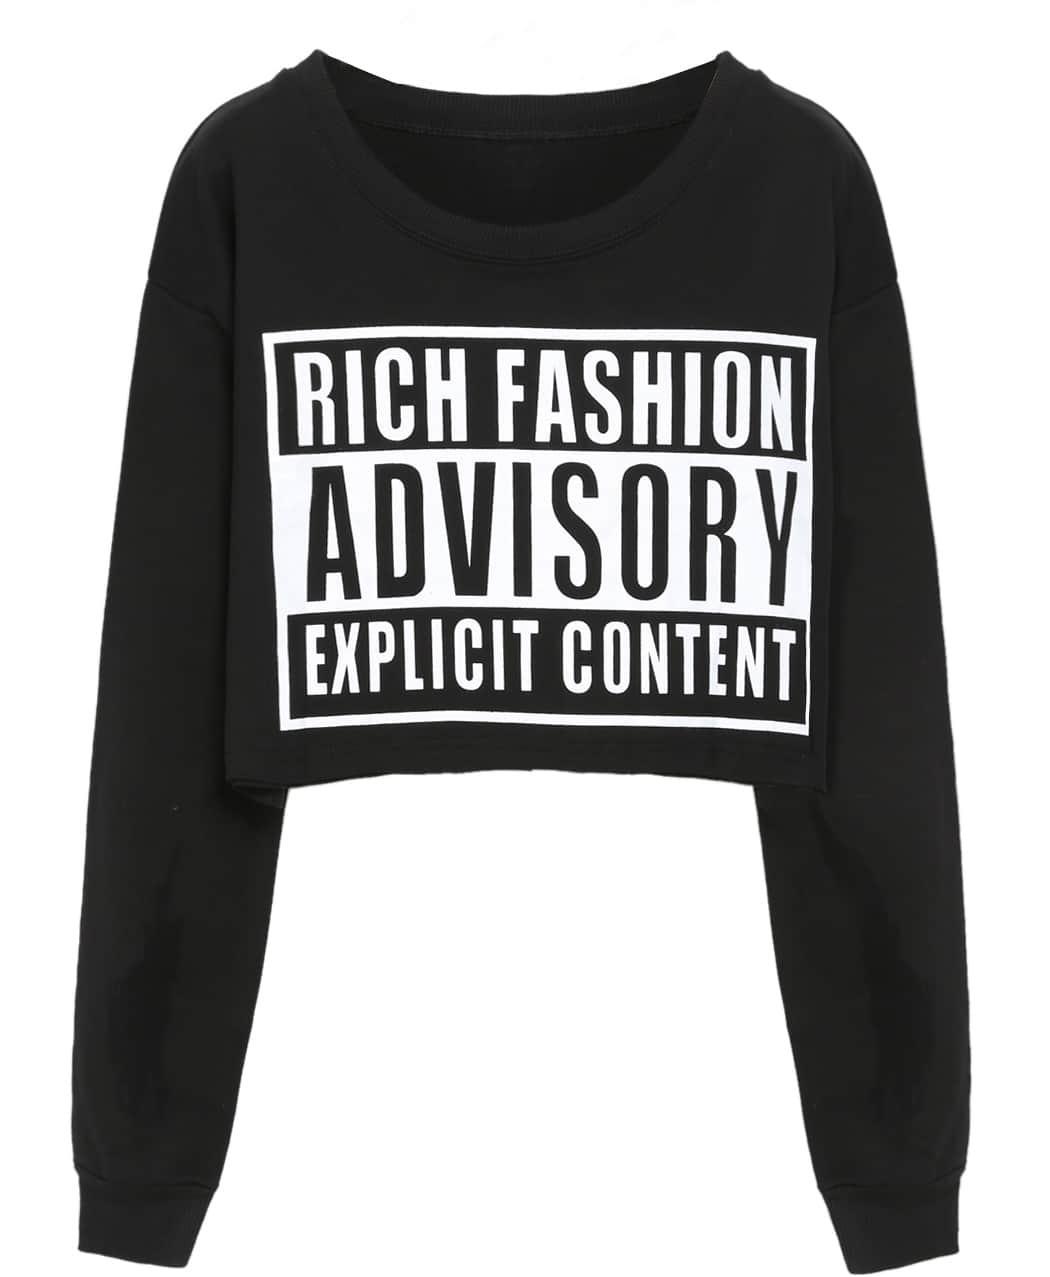 47a40ffa024 Black Round Neck ADVISORY Print Crop Sweatshirt - Latest Fashion ...